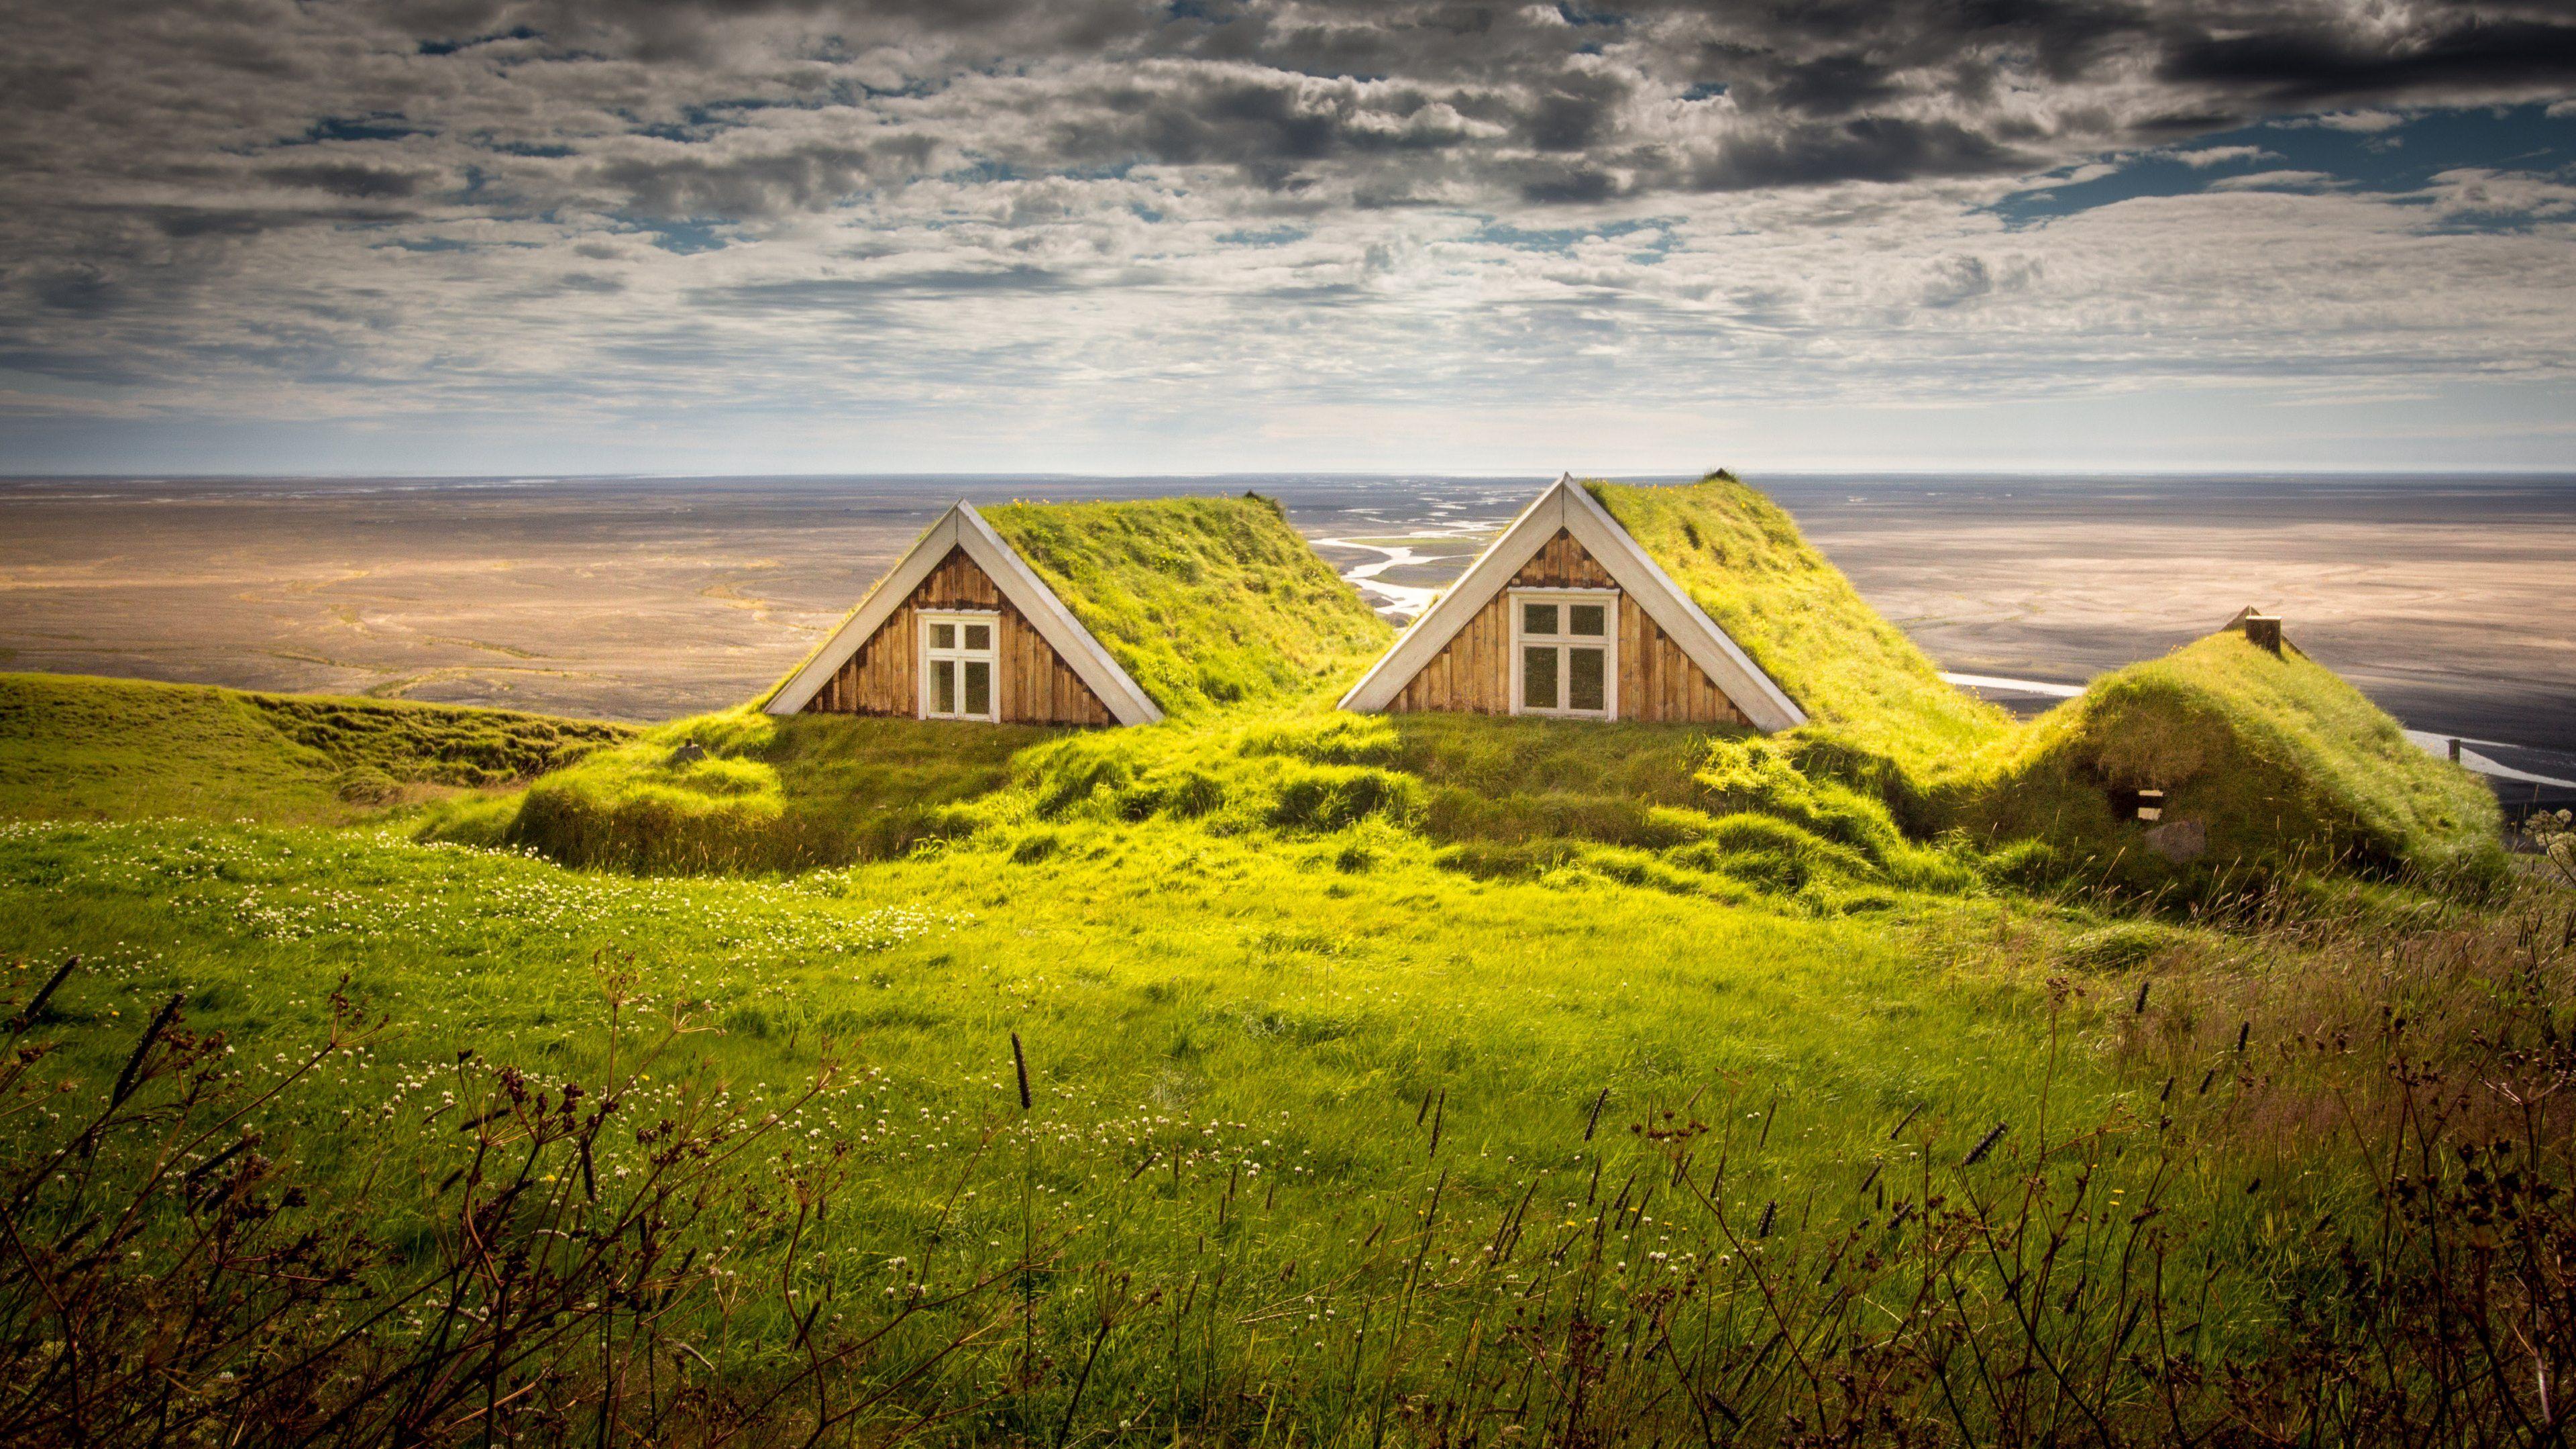 Iceland Houses Landscape Summer Iceland House House Landscape Summer Landscape